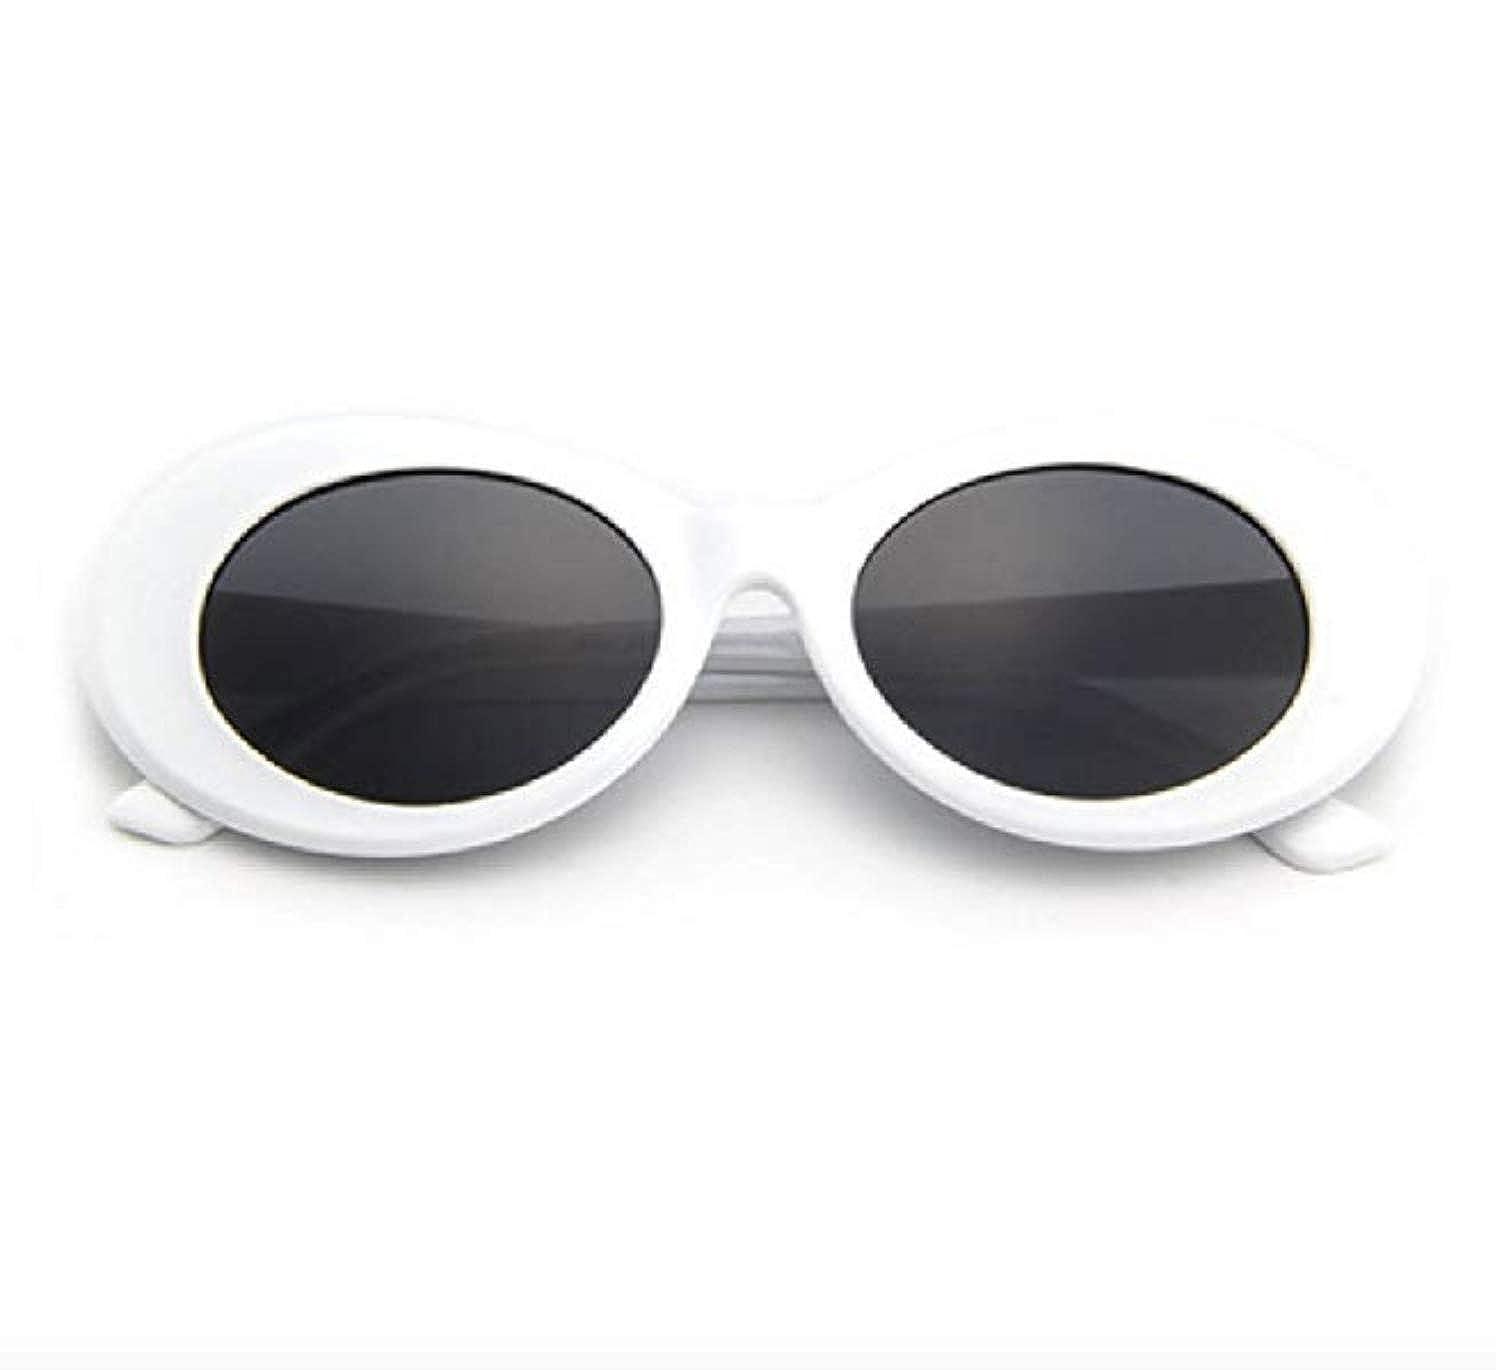 "39dedb5334 Amazon.com  THE ORIGINAL ""Clout Goggles"" 100% Authentic - HypeBeast Supreme  Pure White  Clothing"